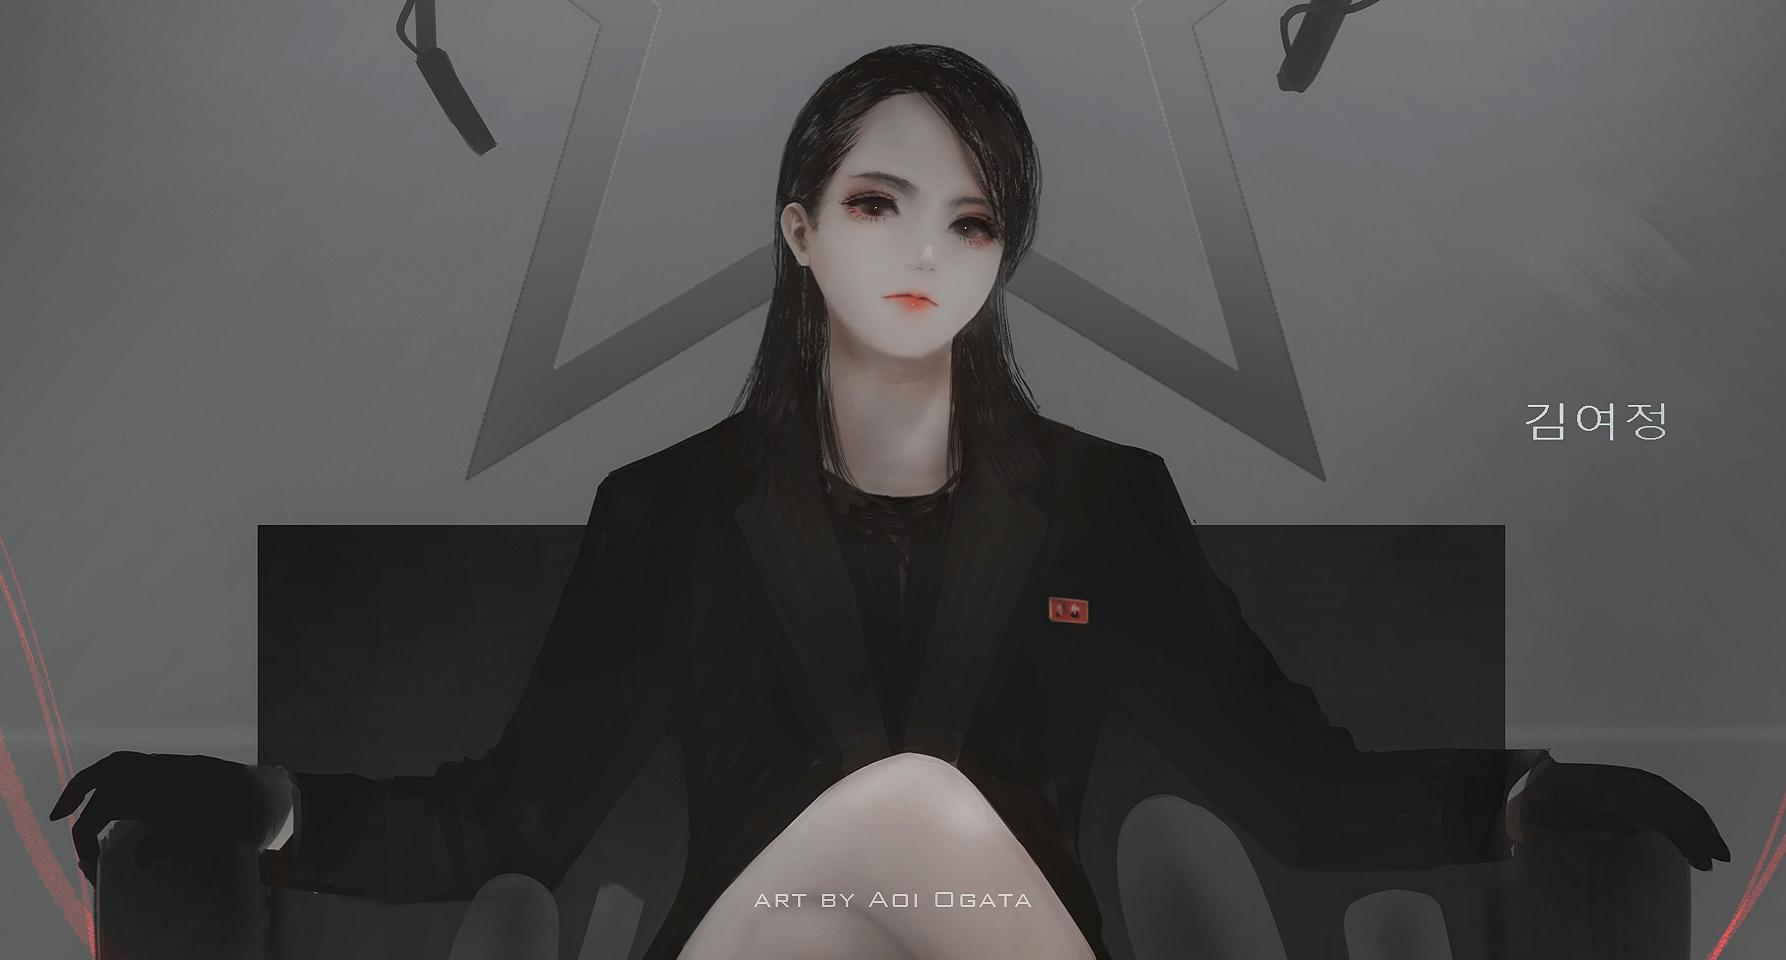 Anime 1786x960 anime anime girls Aoi Ogata fan art dictators Kim Yo-jong